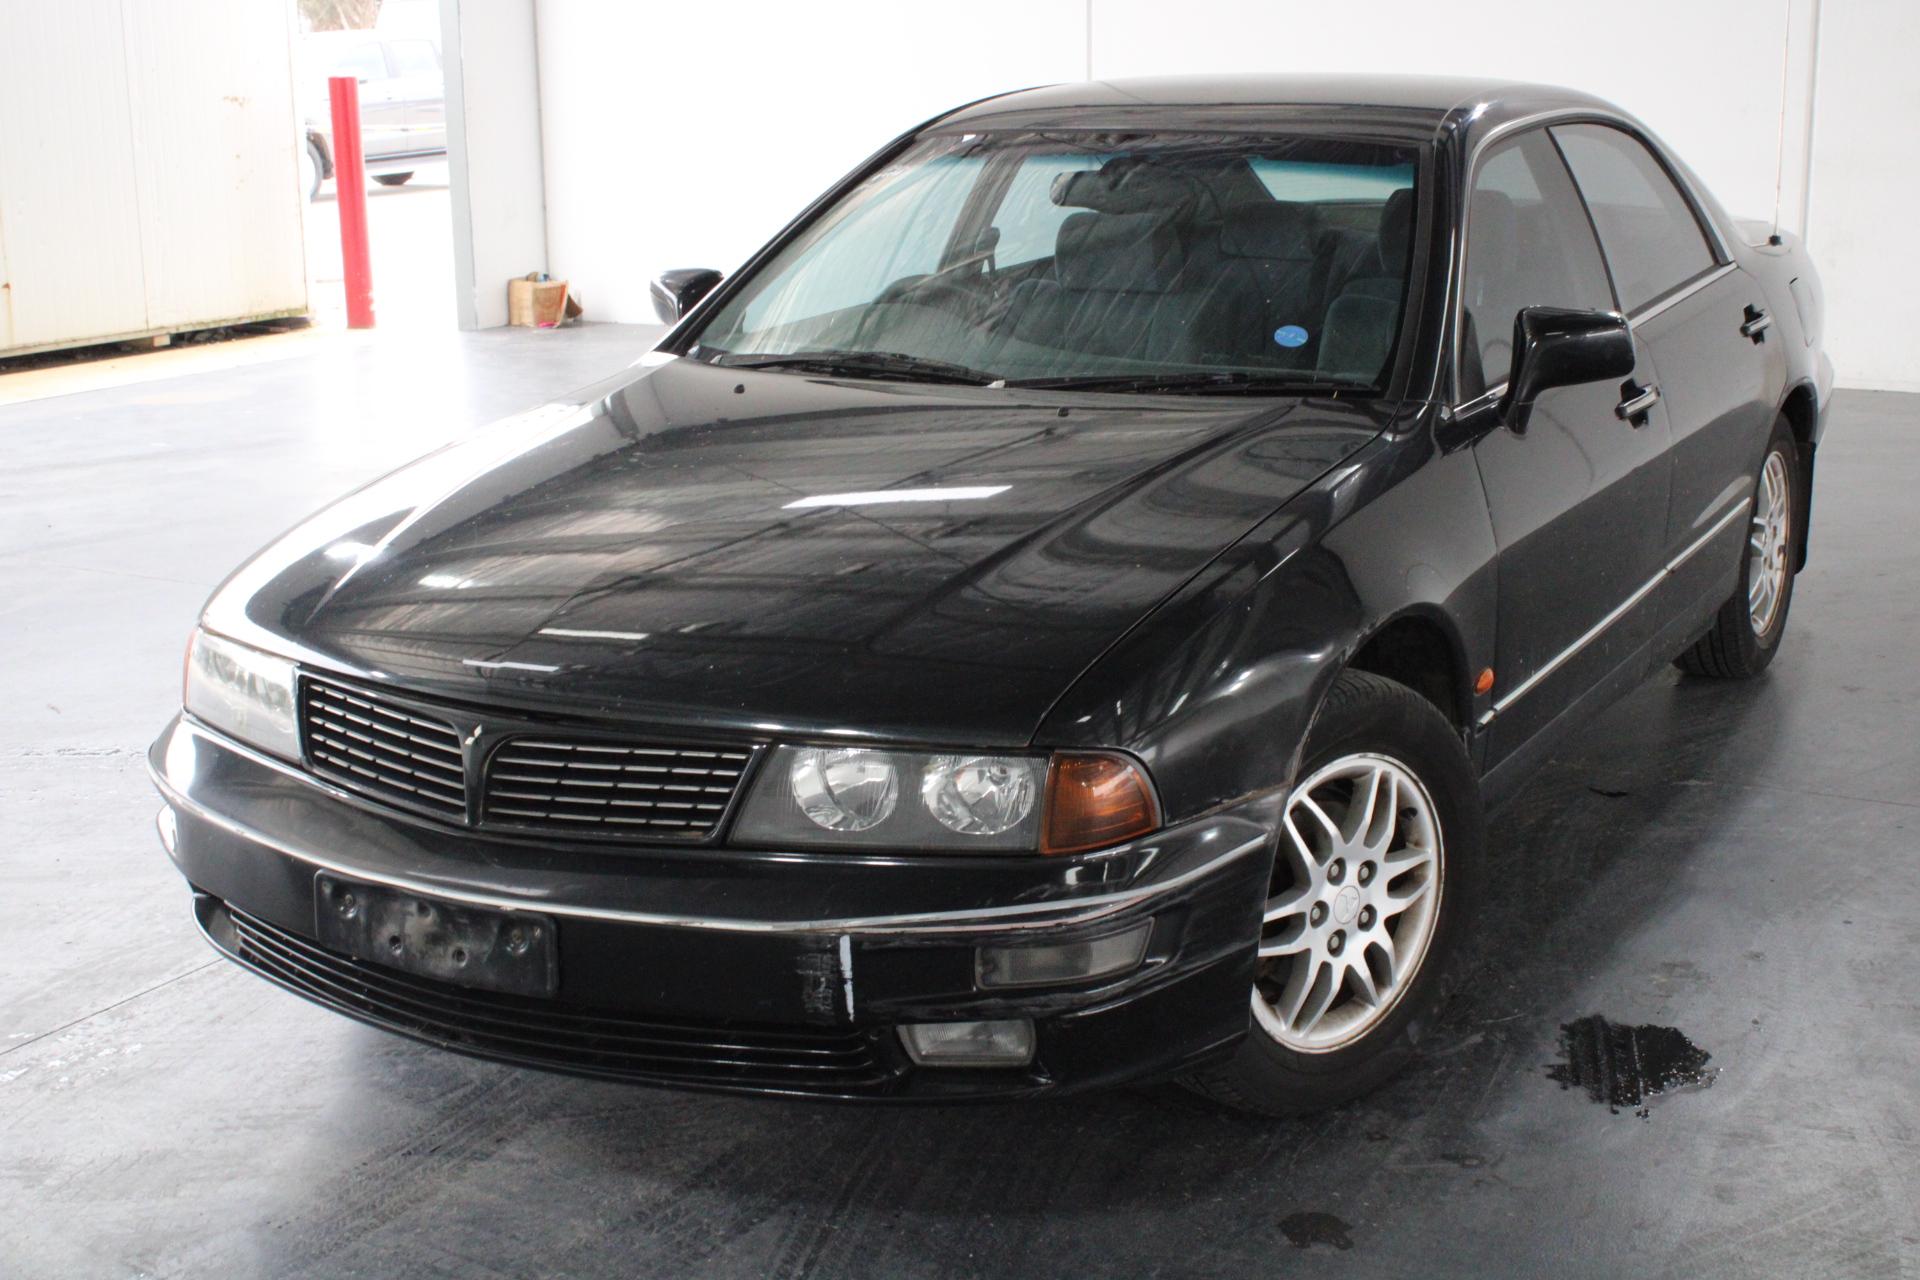 1999 Mitsubishi Verada Ei KH Automatic Sedan